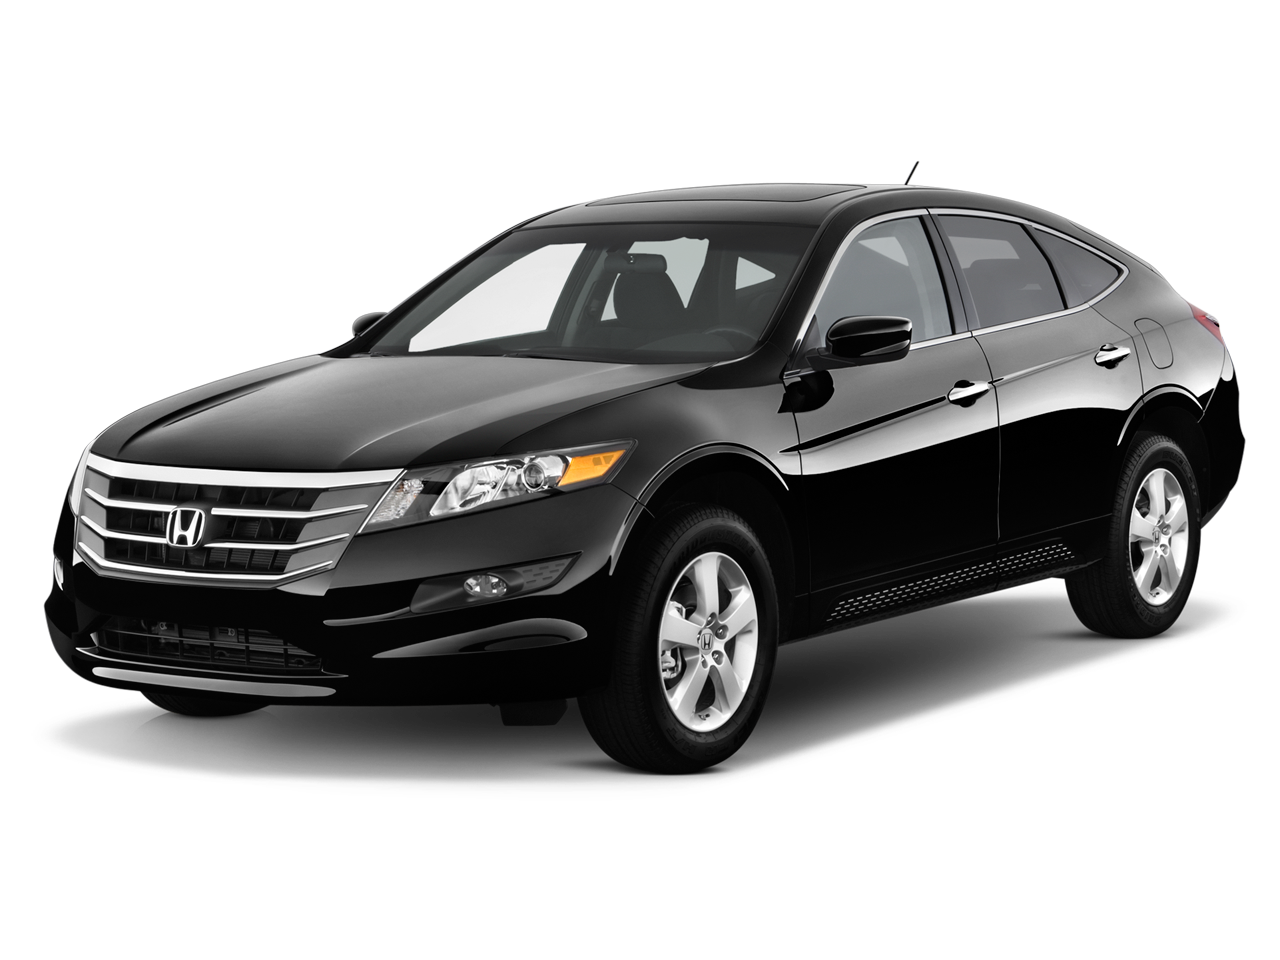 Honda Cars PNG Image.